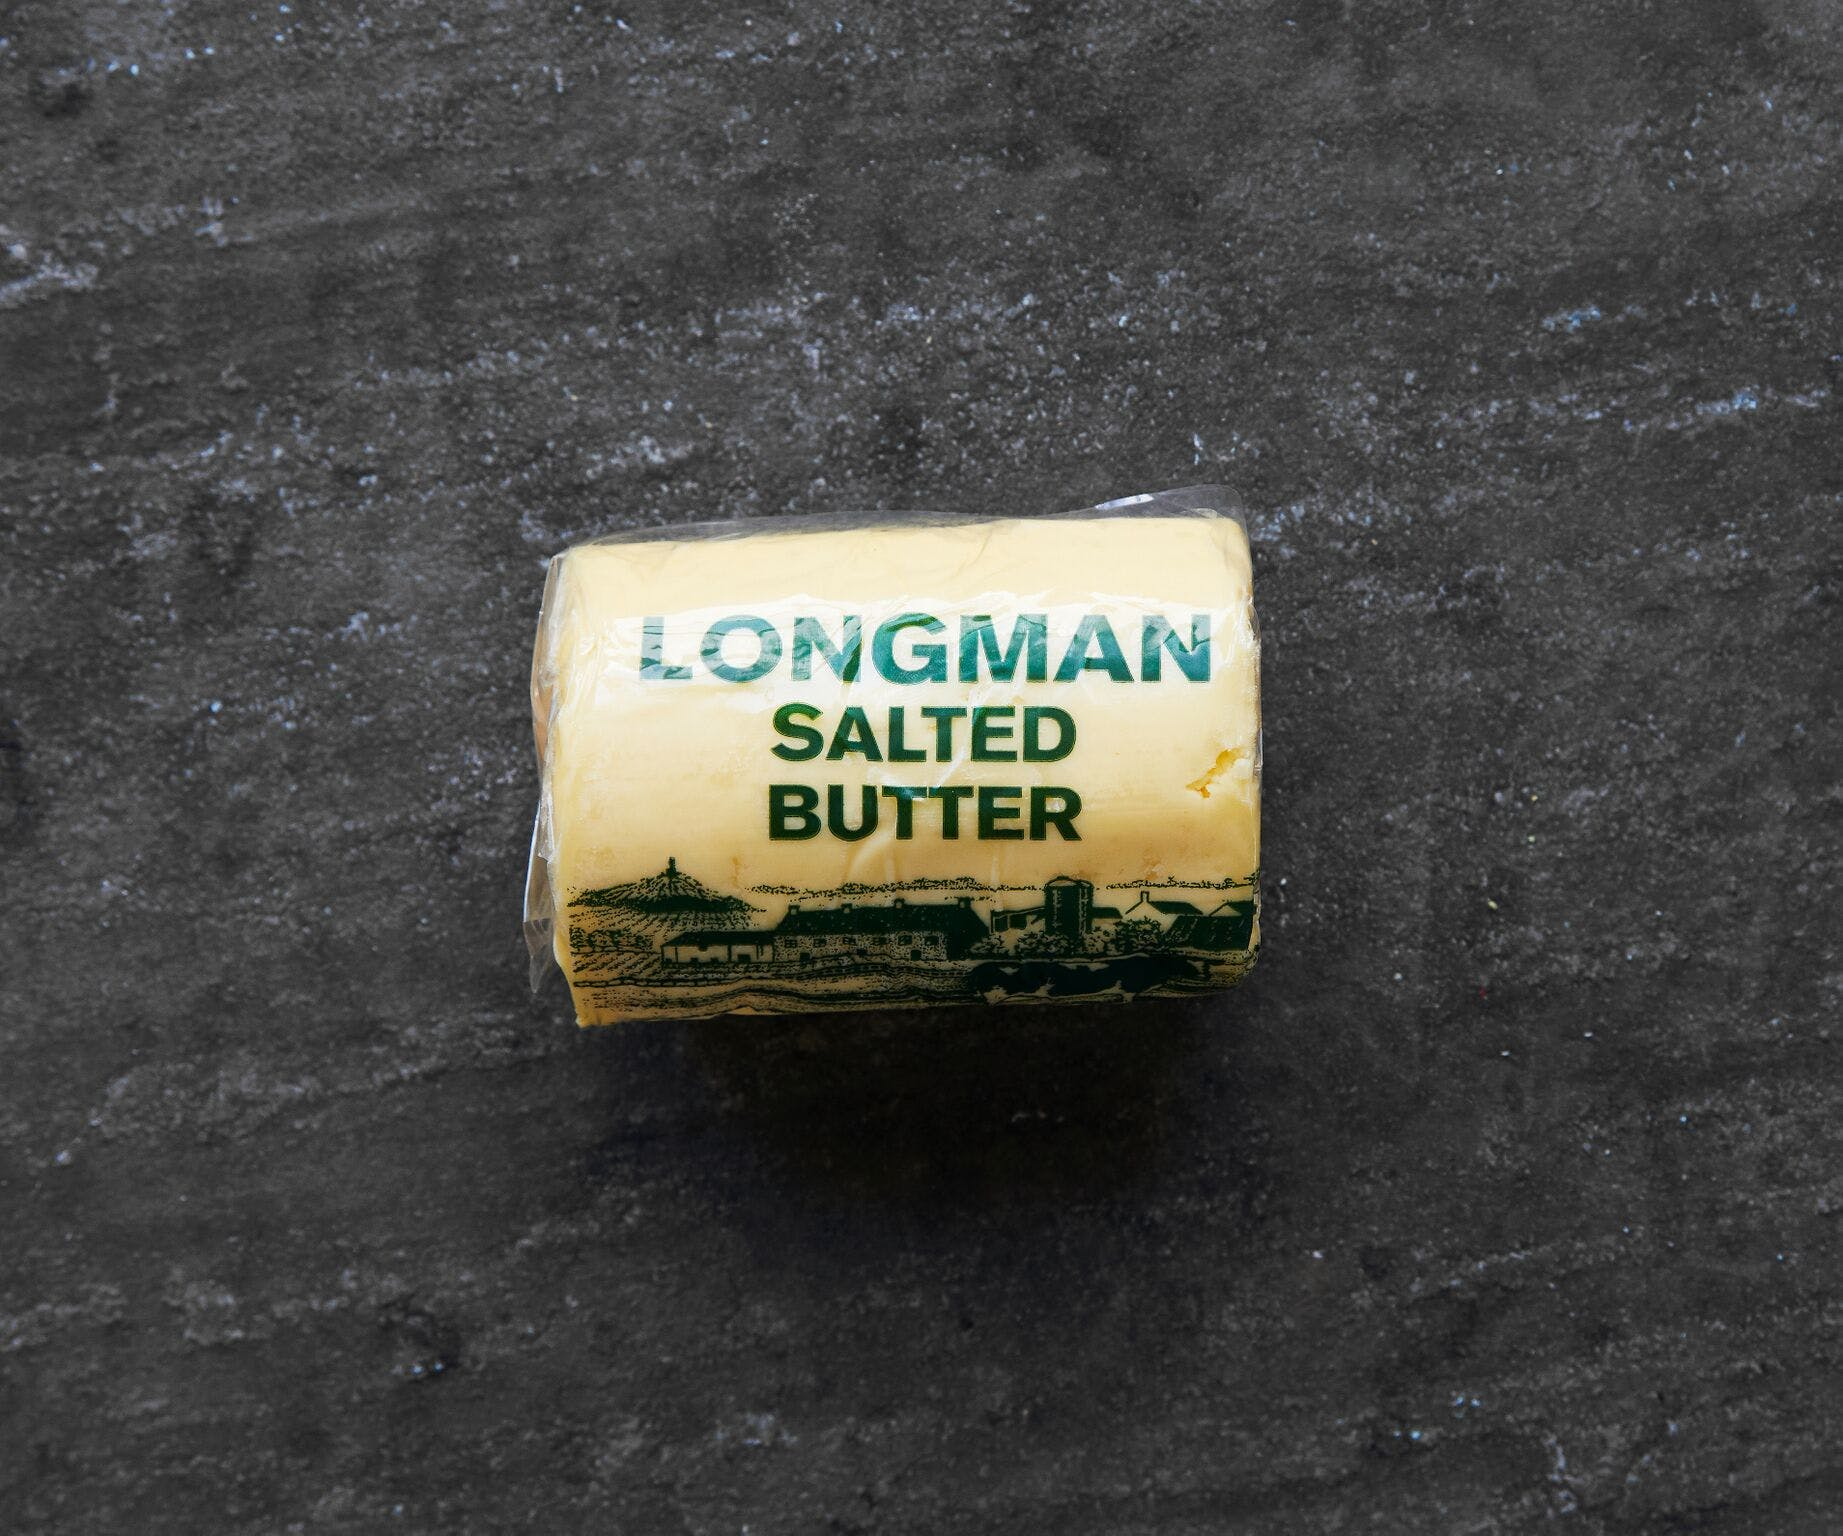 Longman's Salted Butter